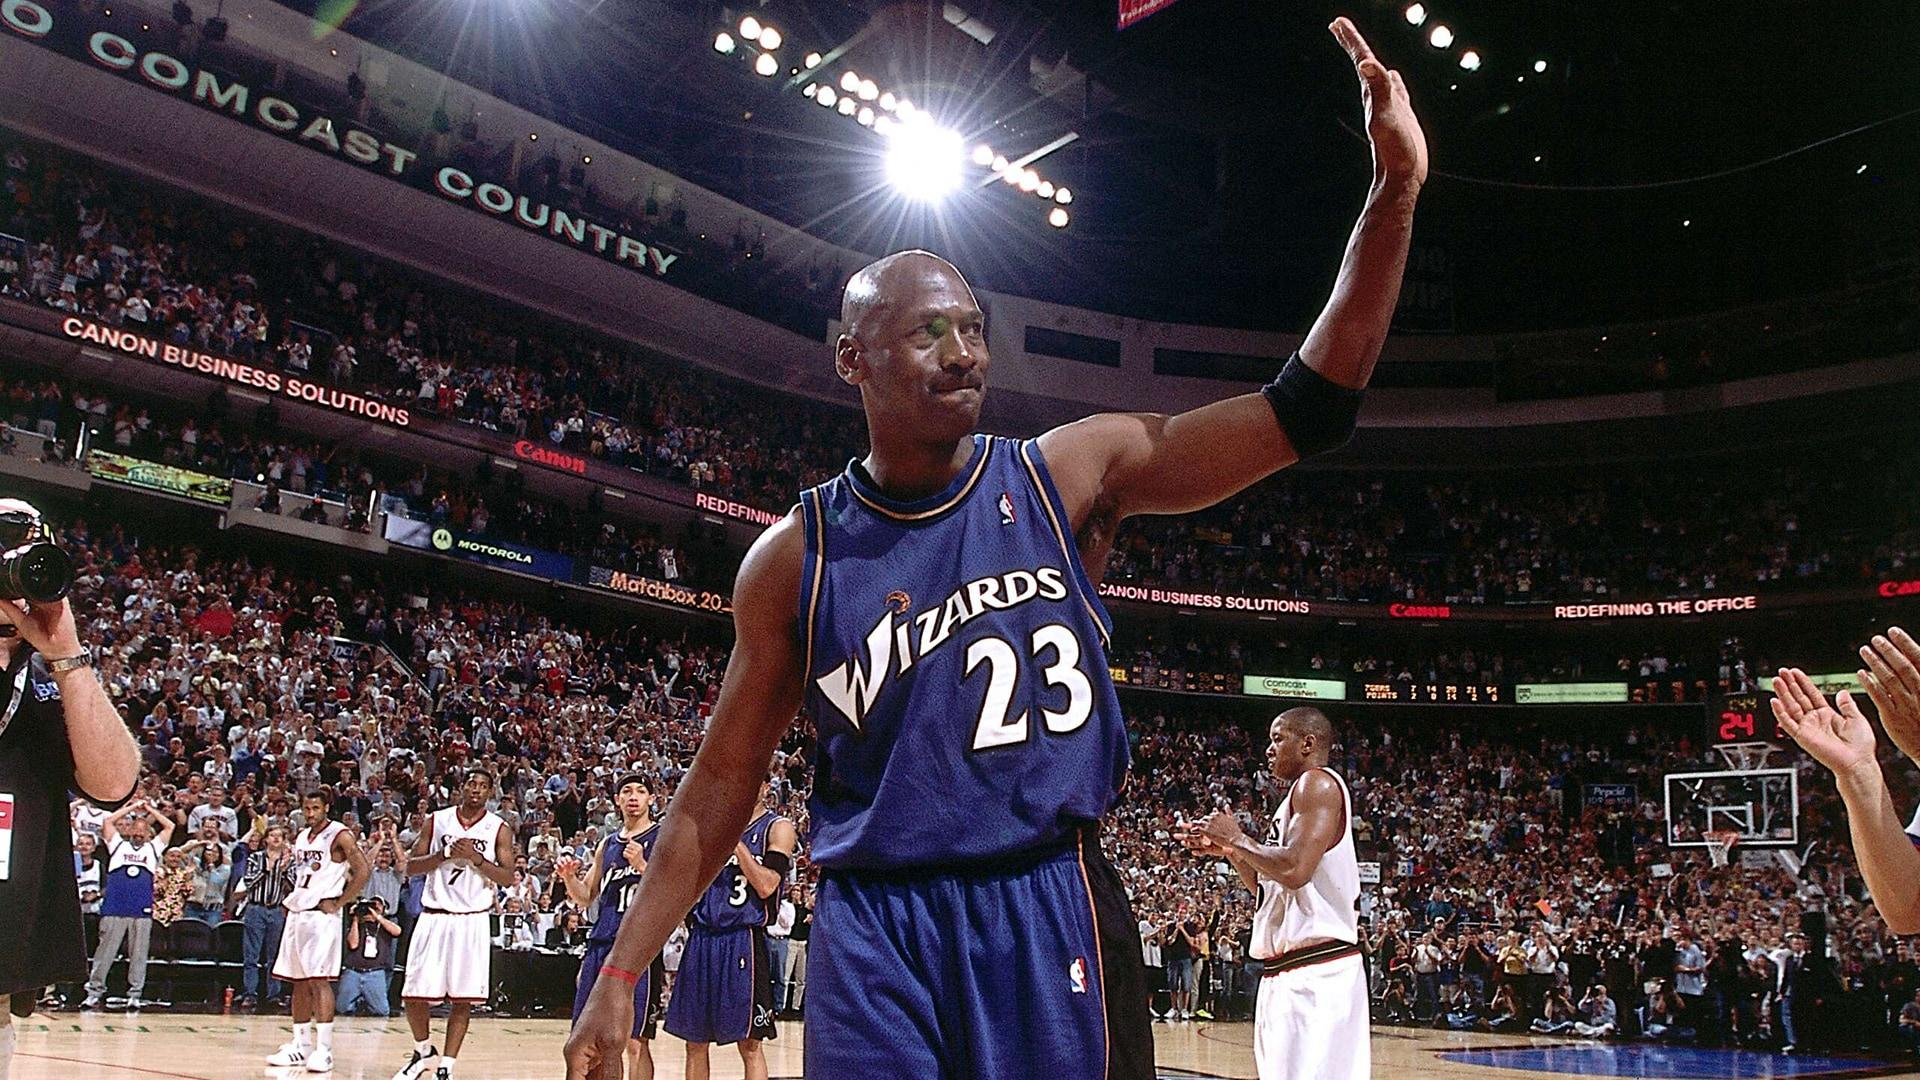 Top Moments: Michael Jordan returns to NBA at age 38